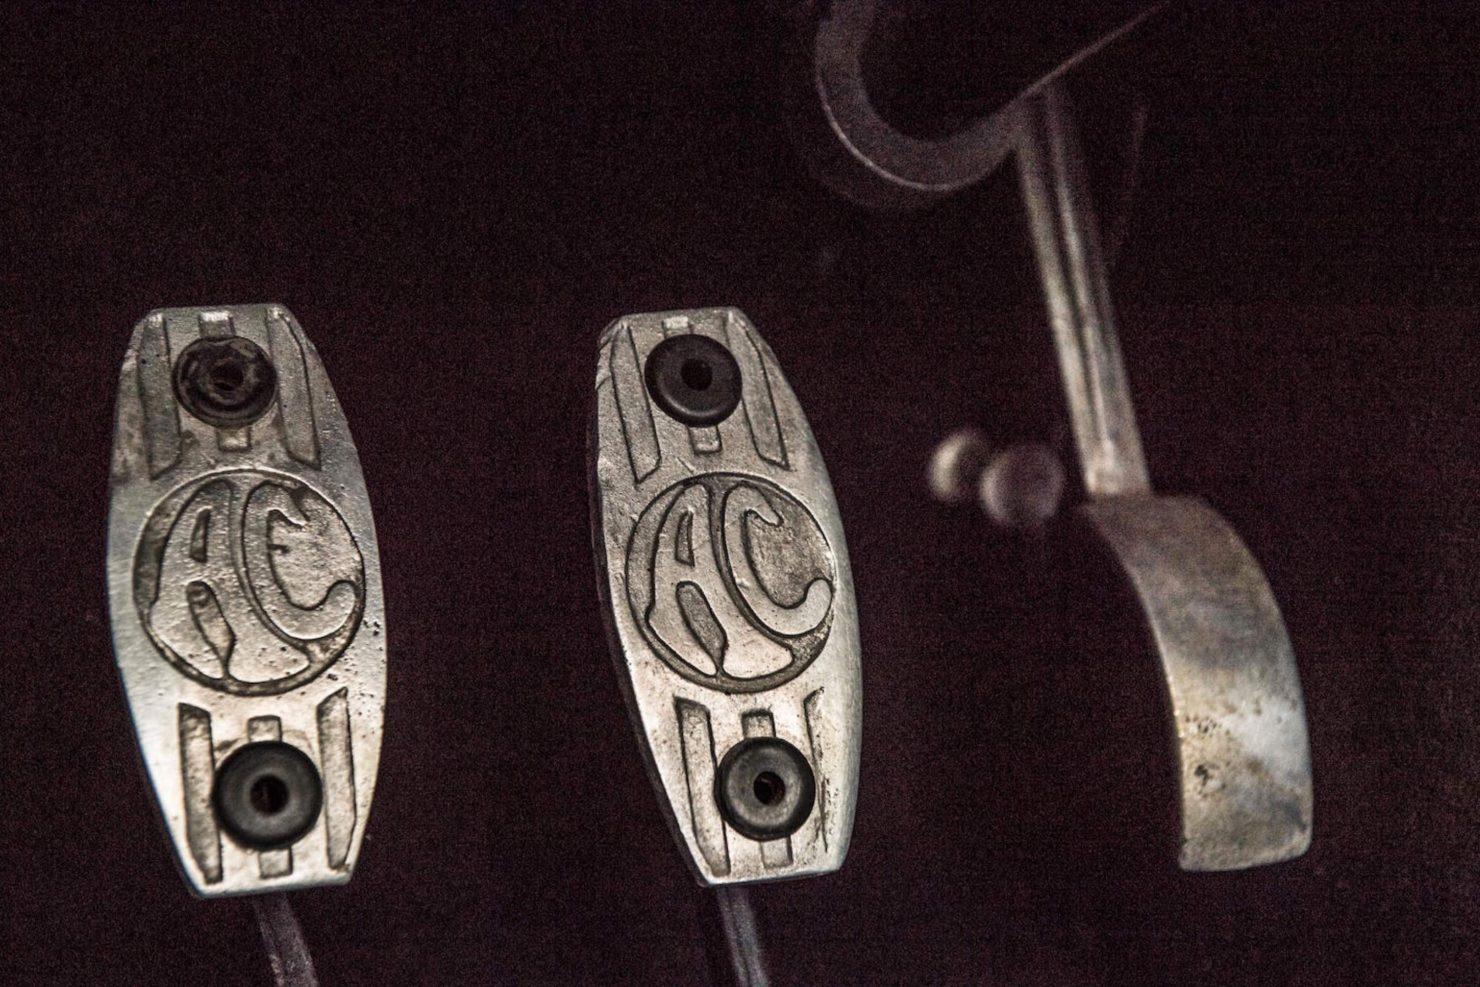 shelby ac cobra 289 14 1480x987 - 1964 Shelby AC Cobra 289